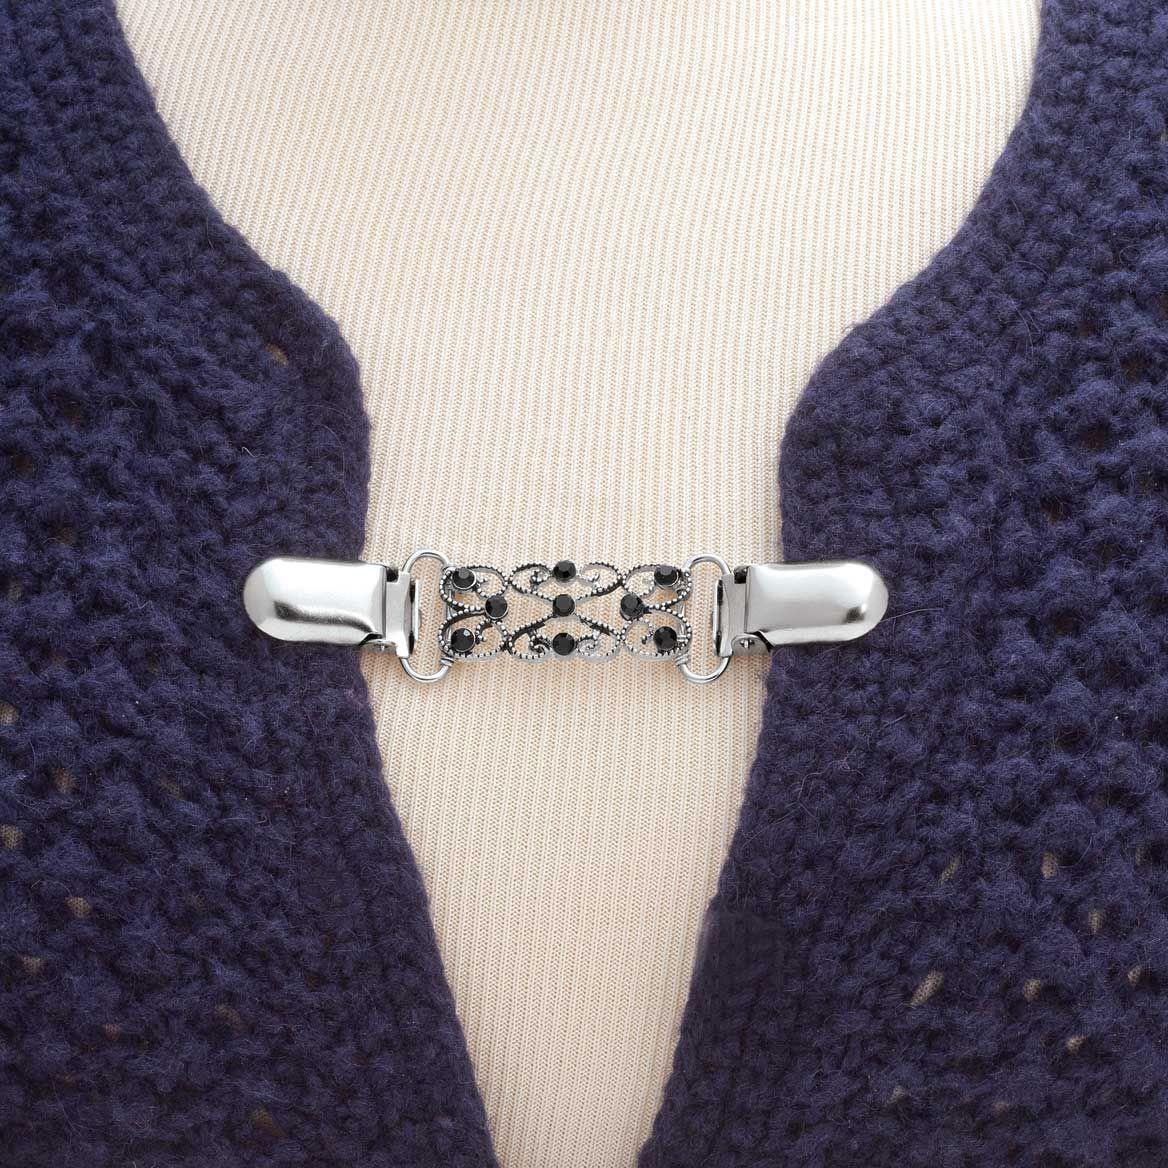 Decorative Sweater Silvertone Clasp-358371